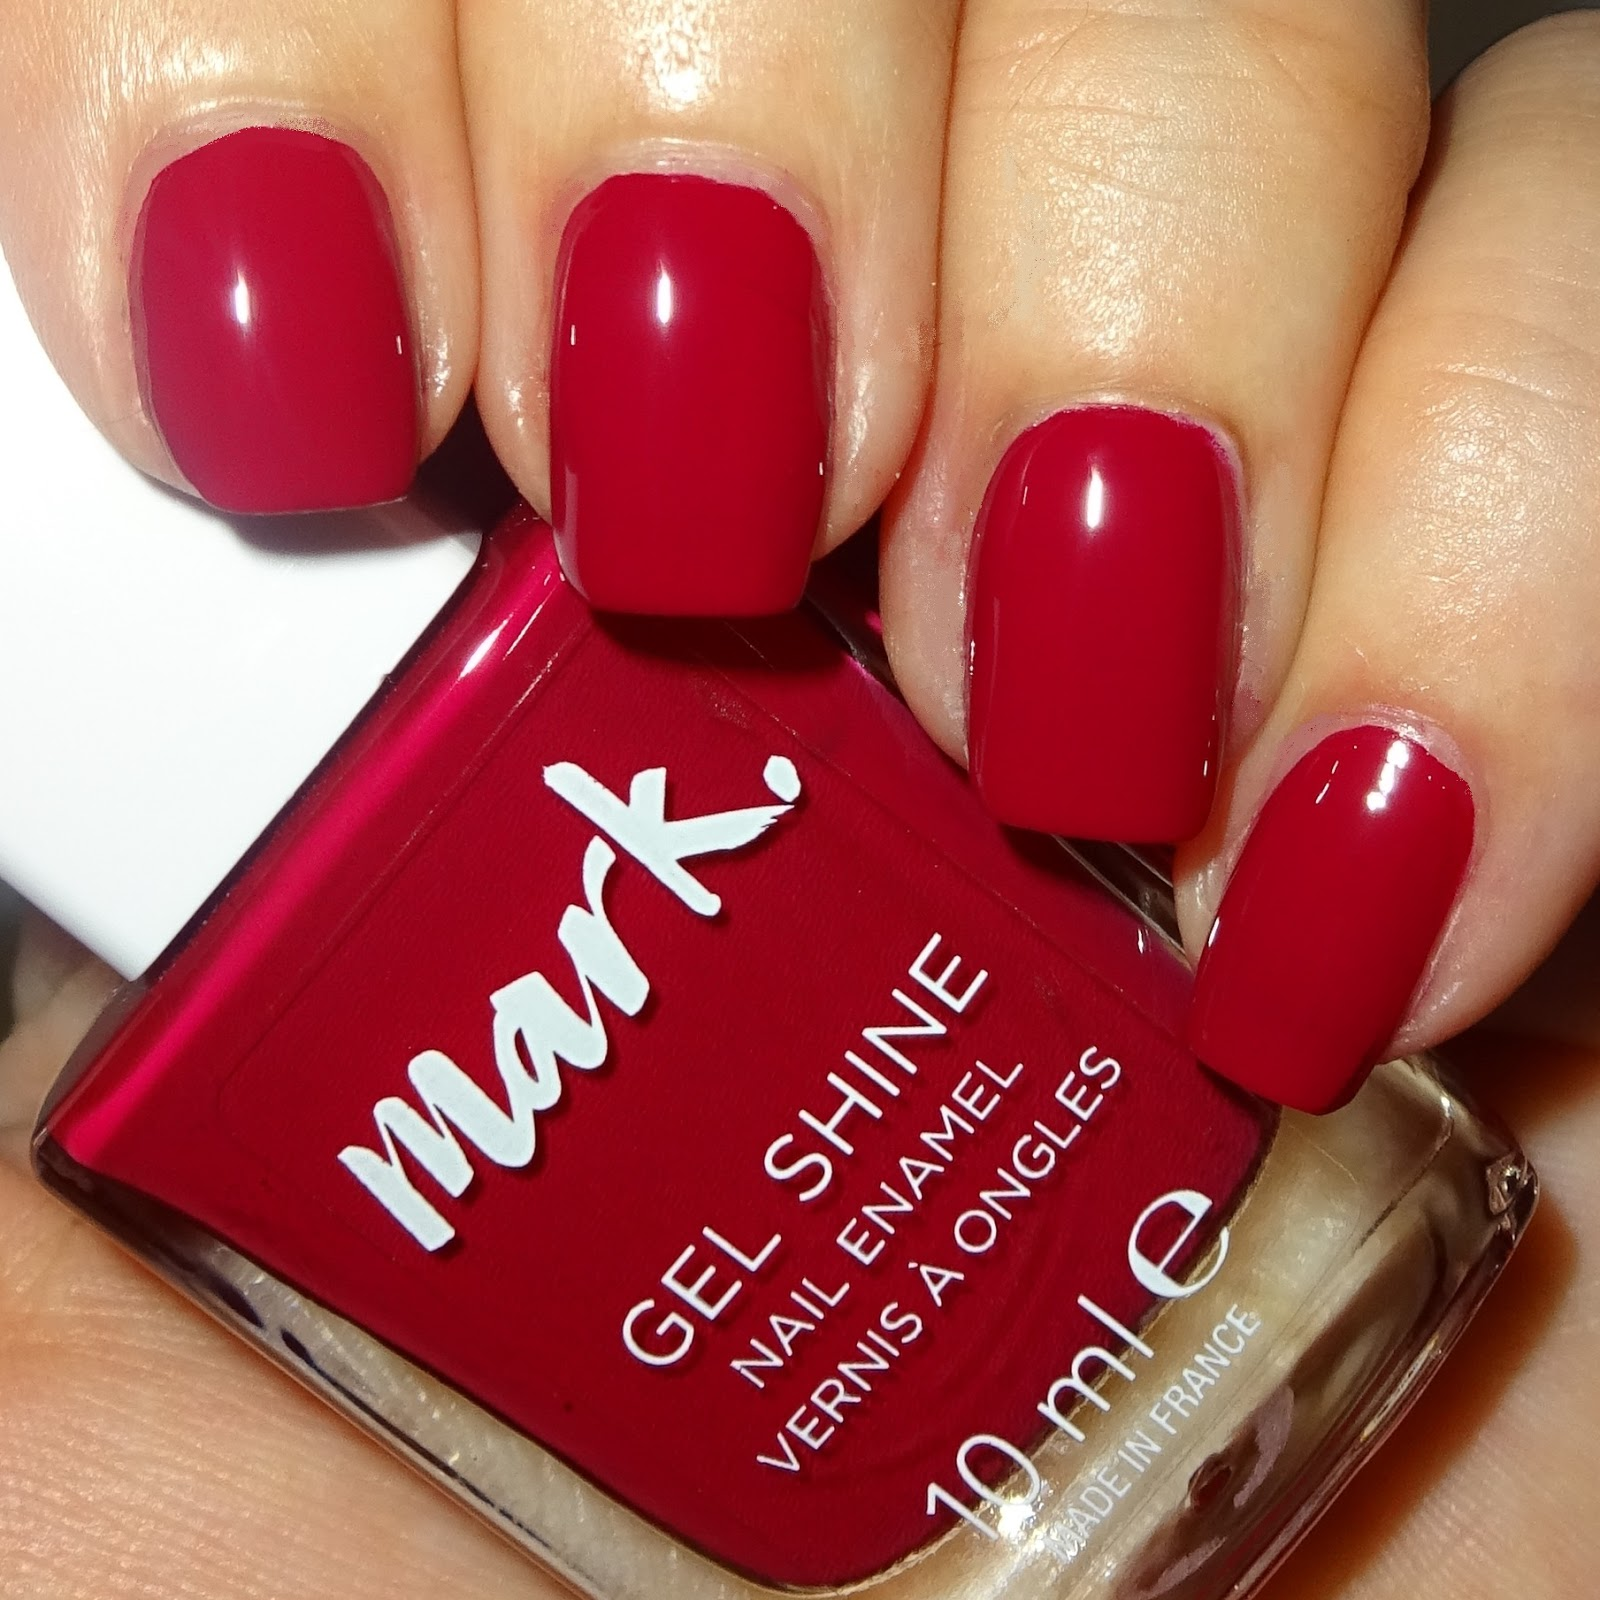 Wendy\'s Delights: Avon Mark Gel Shine Nail Enamels - Parfait Pink ...